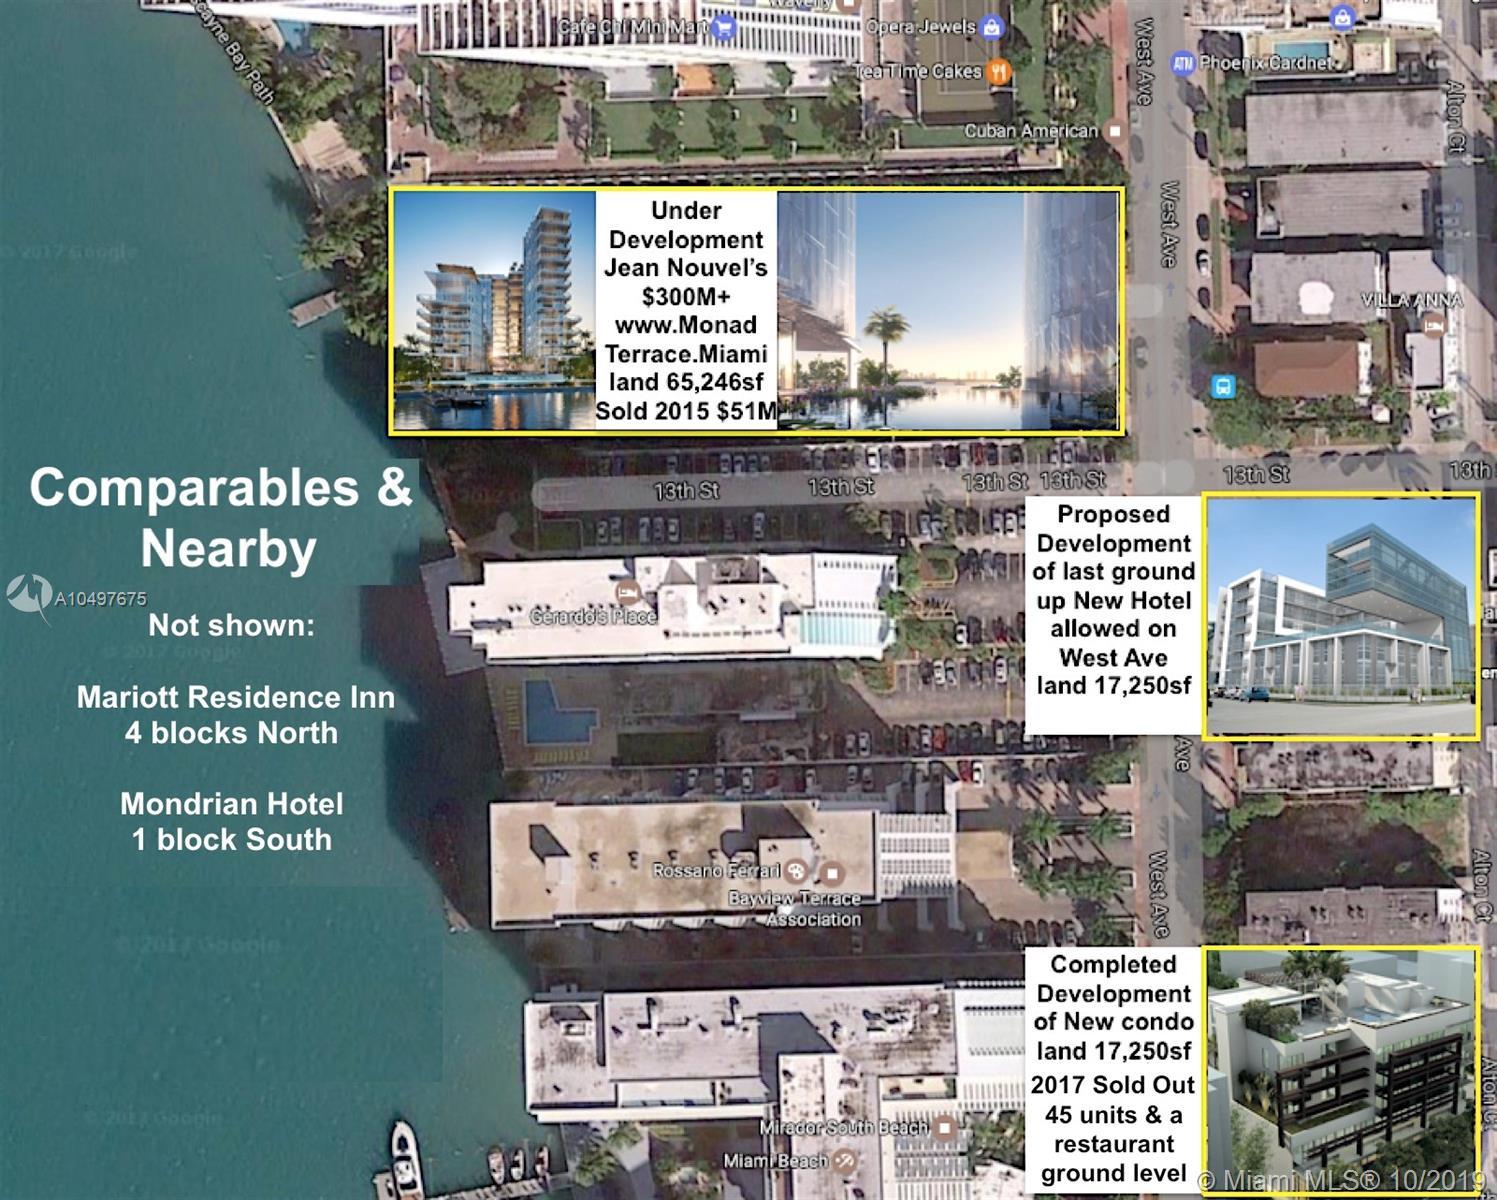 1255 West Av Miami Beach, FL - Image 1